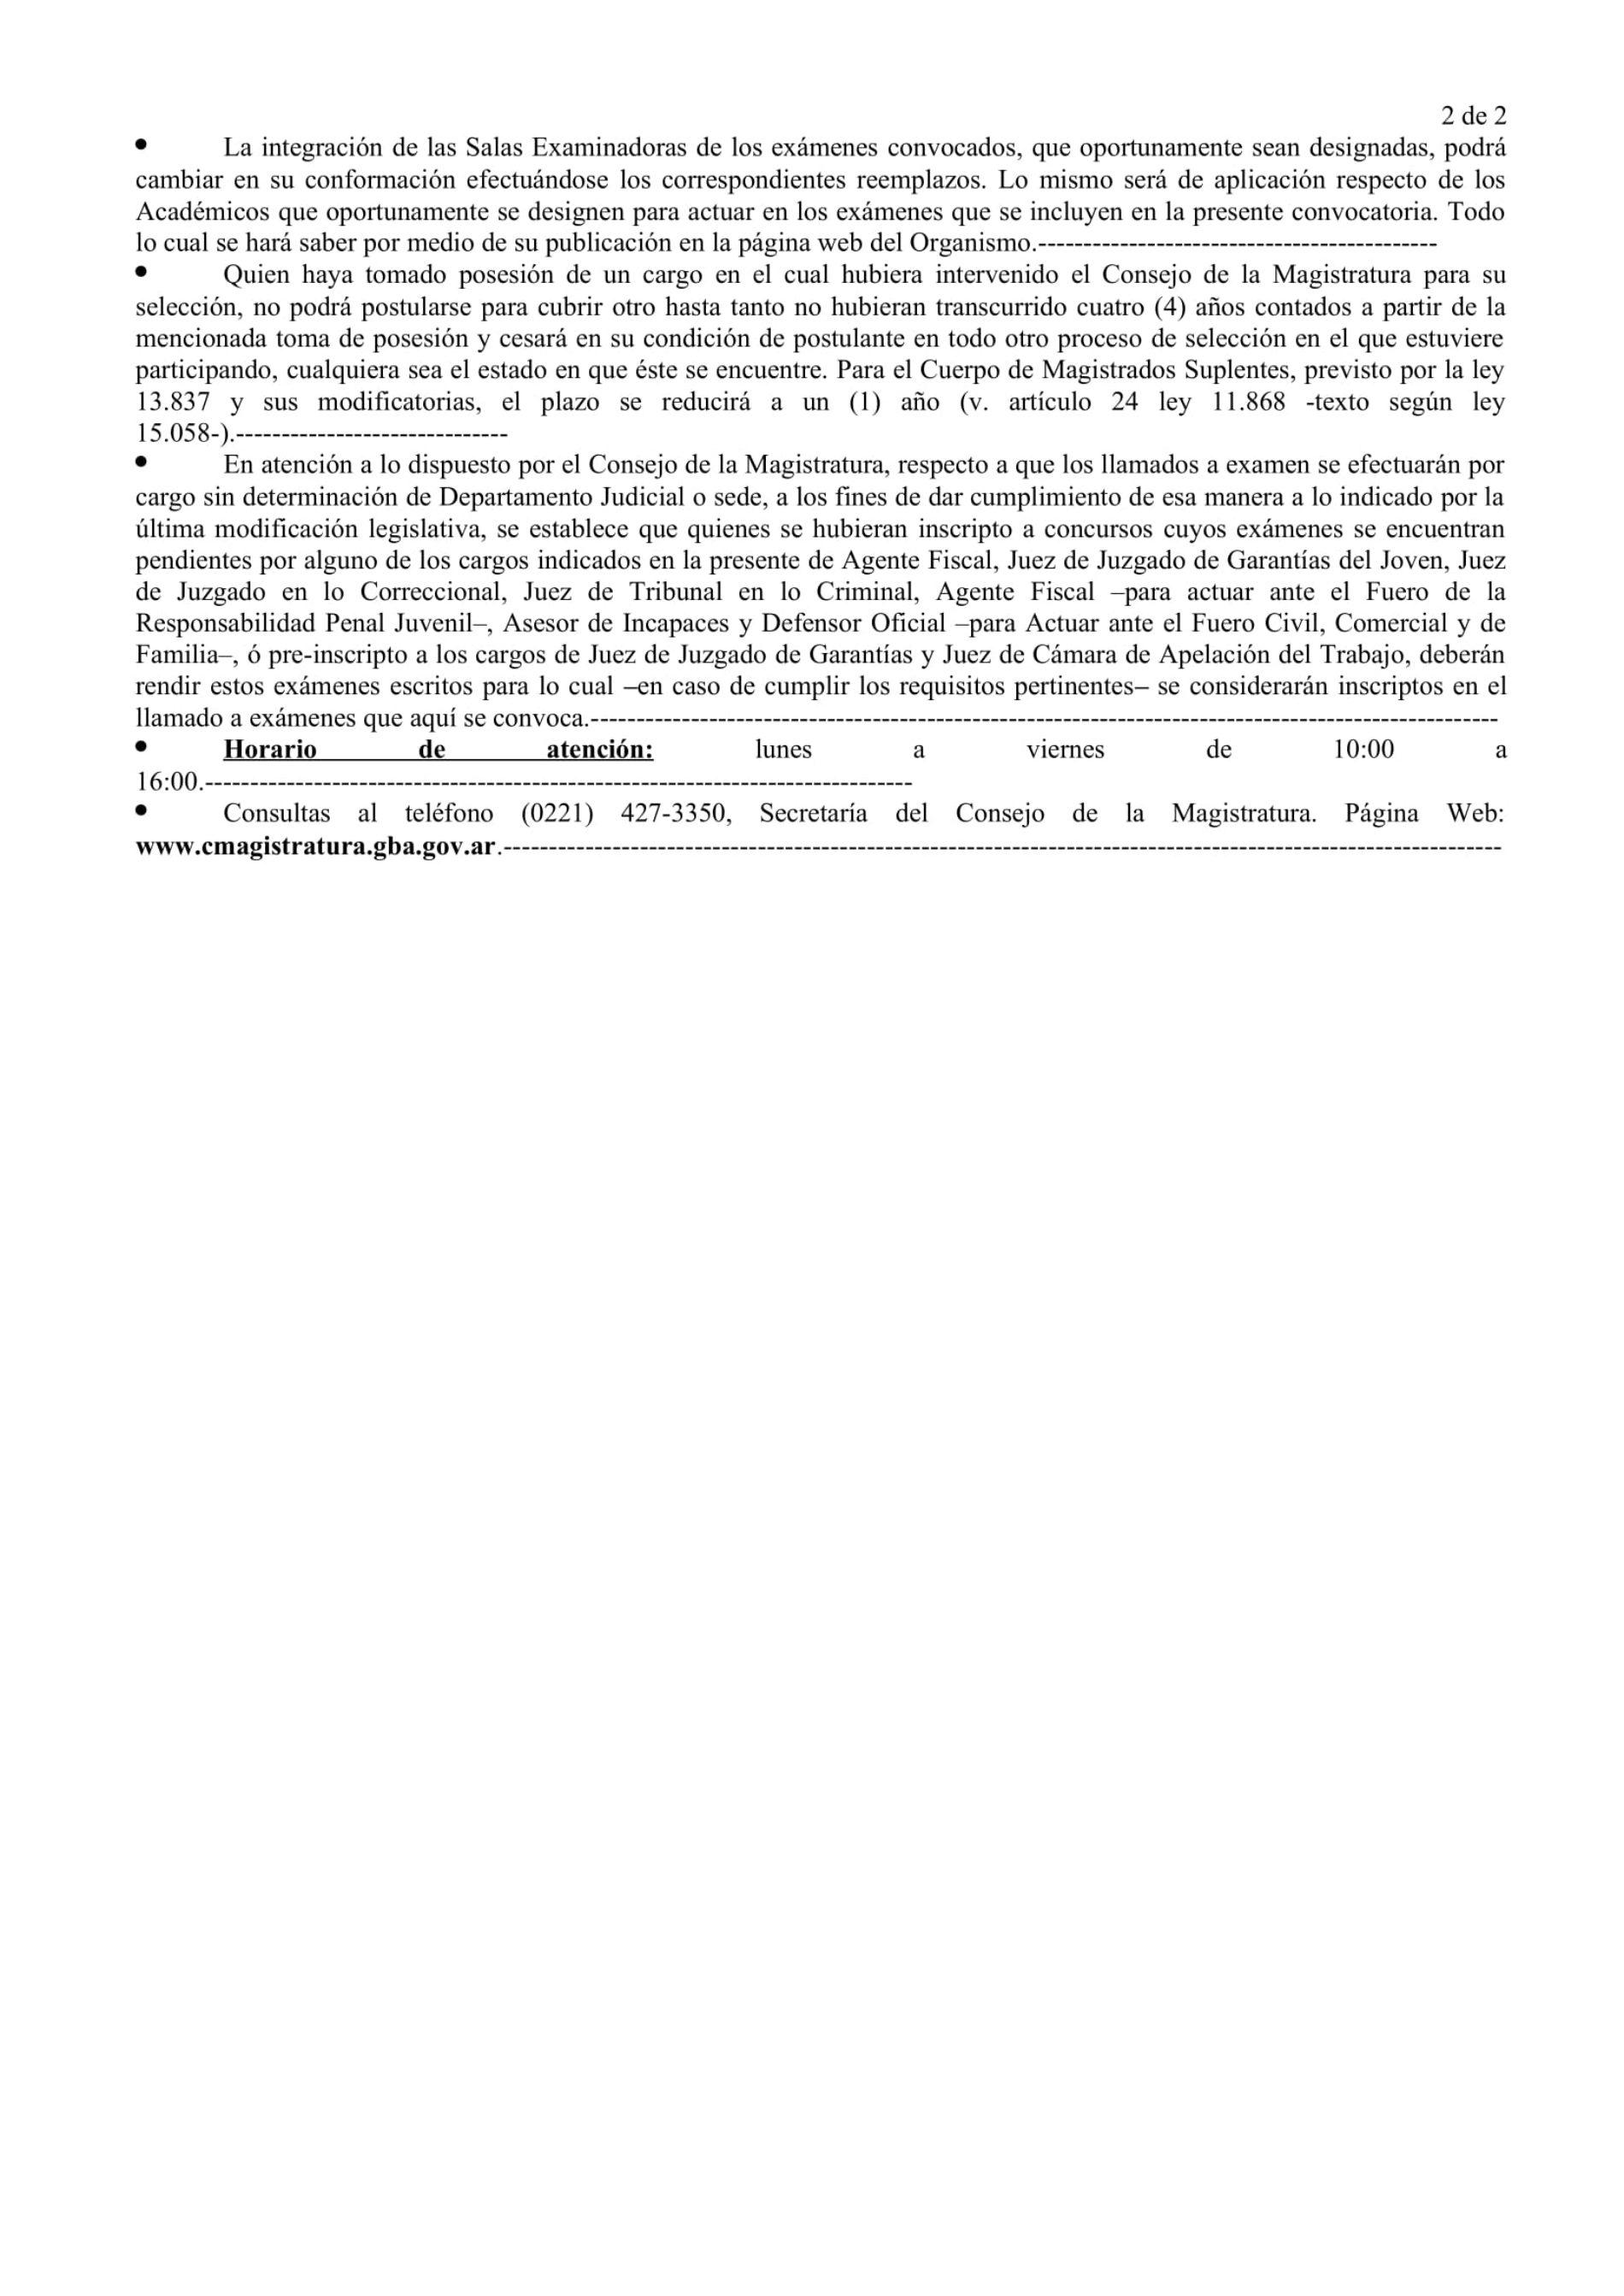 Consejo de la Magistratura de la Provincia de Buenos Aires. Convocatoria Nro. 1